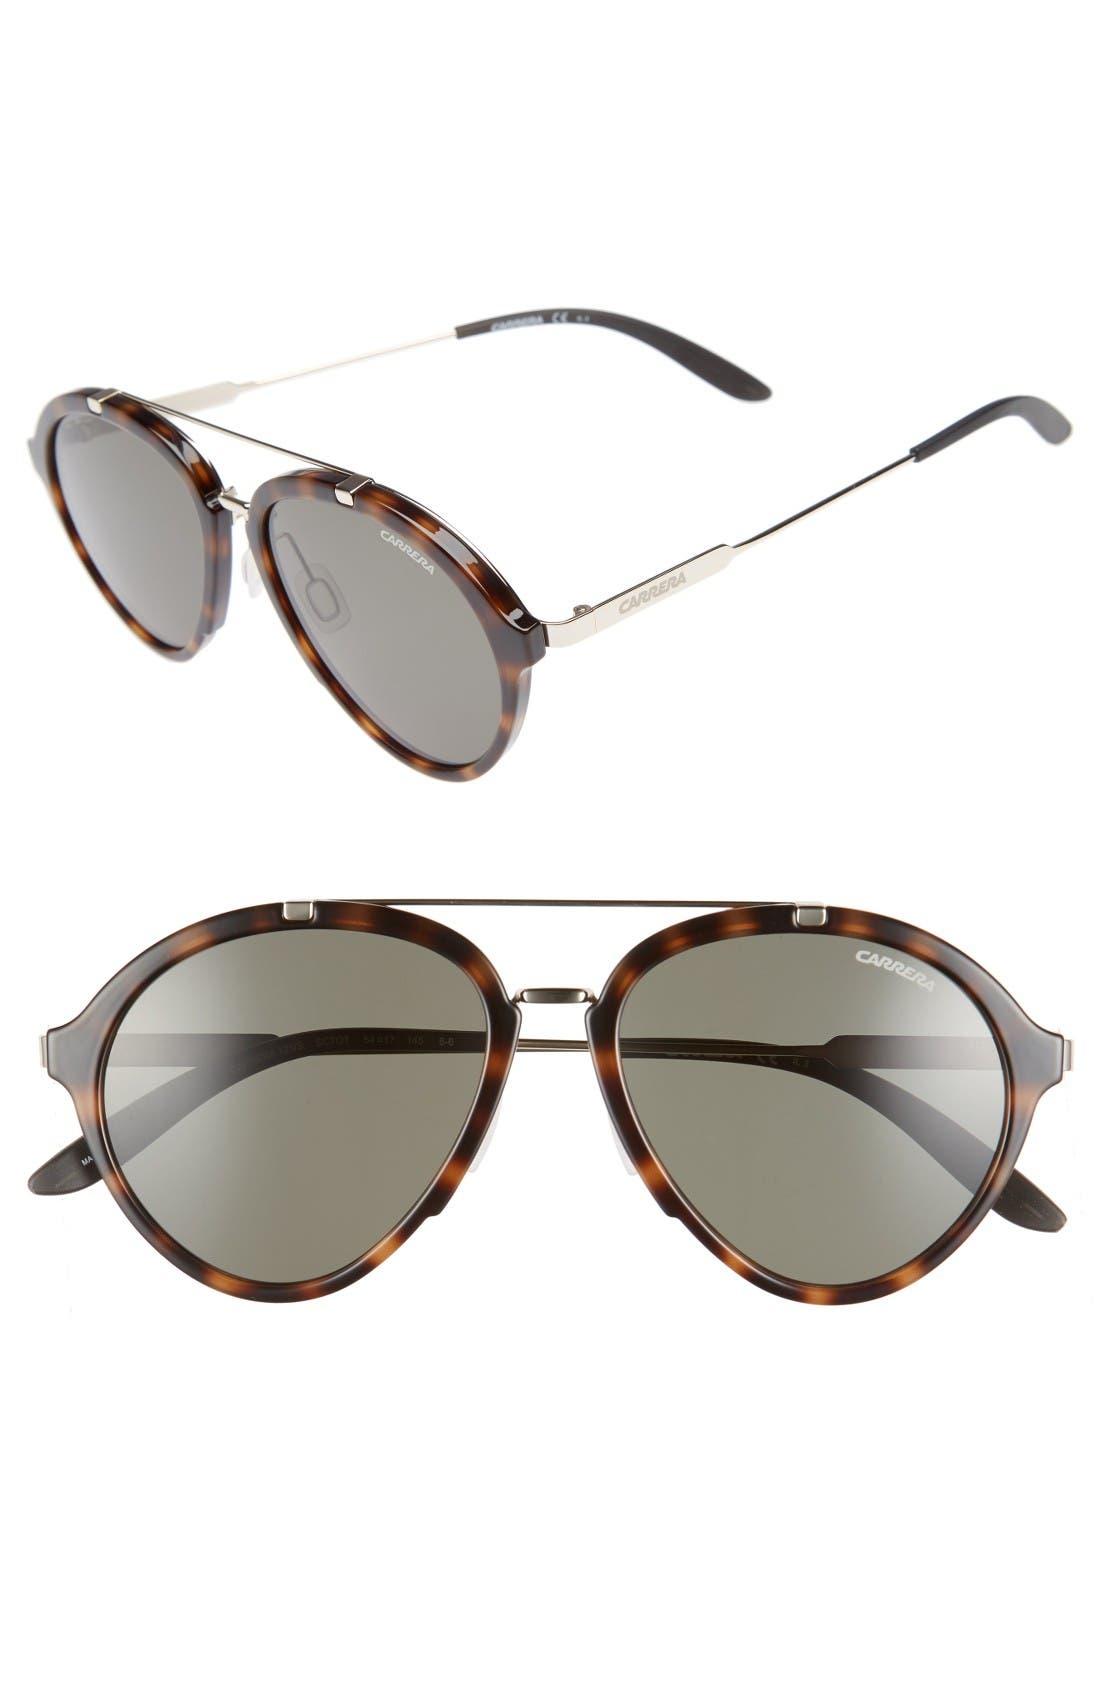 Alternate Image 1 Selected - Carrera Eyewear 54mm Aviator Sunglasses